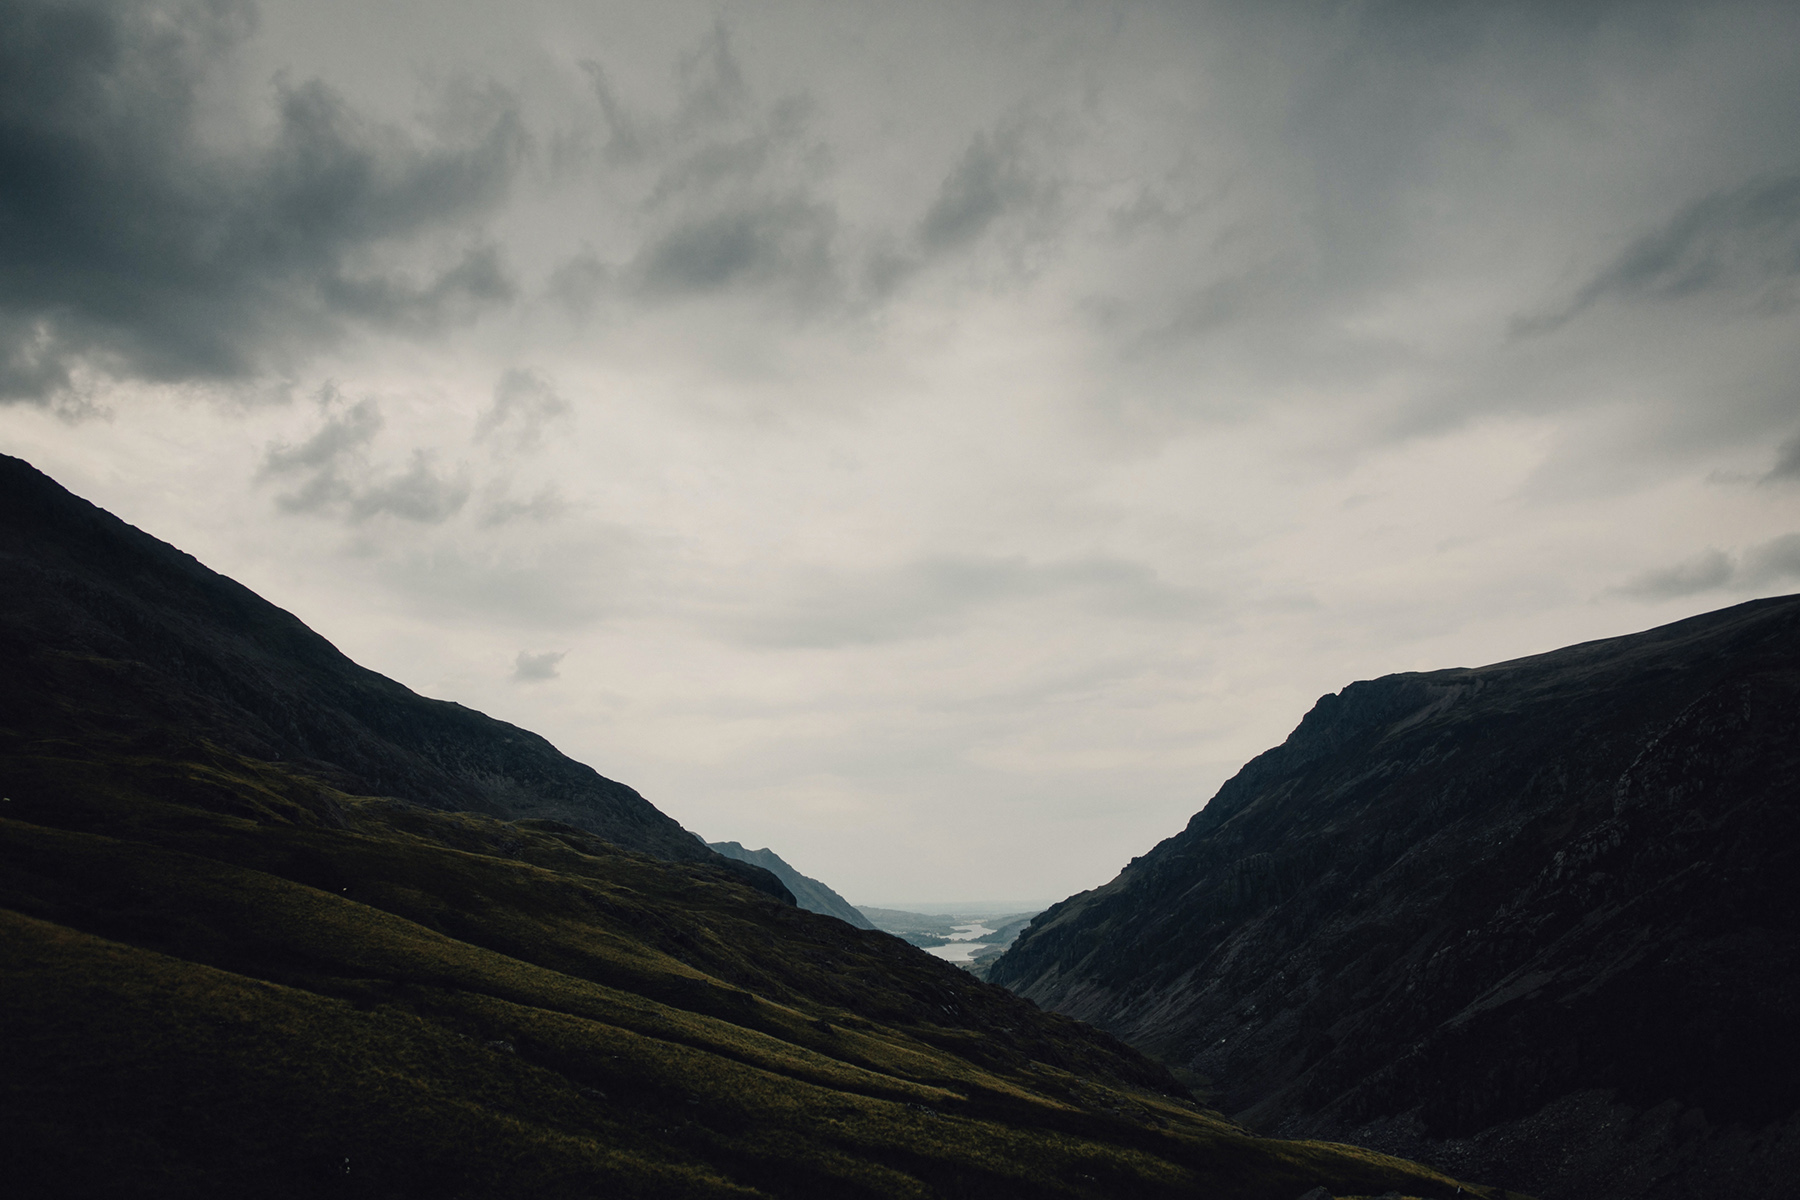 Mt-Snowdon-Hike-Photos-From-Peny-Pass-00231.jpg